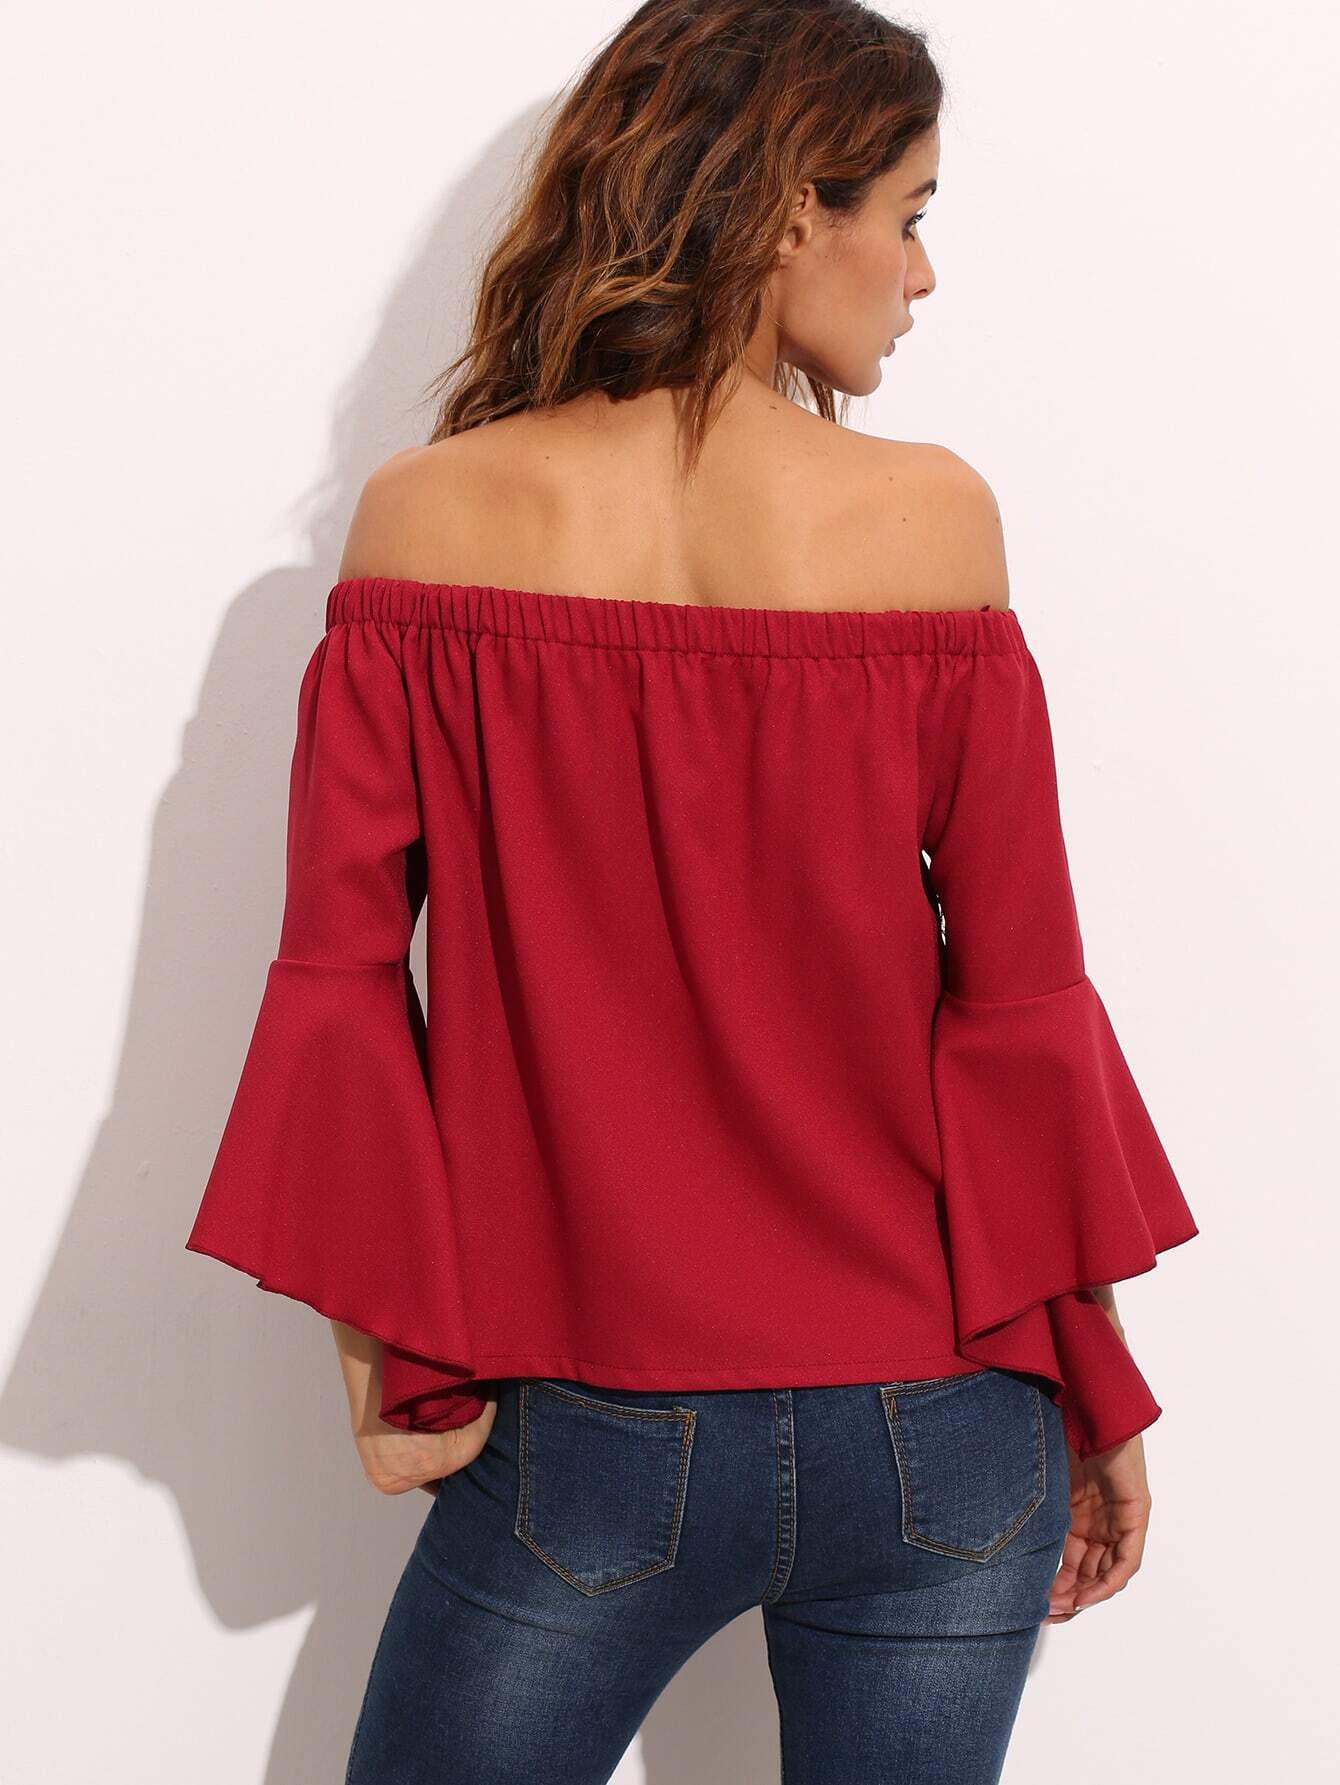 blouse160804001_2